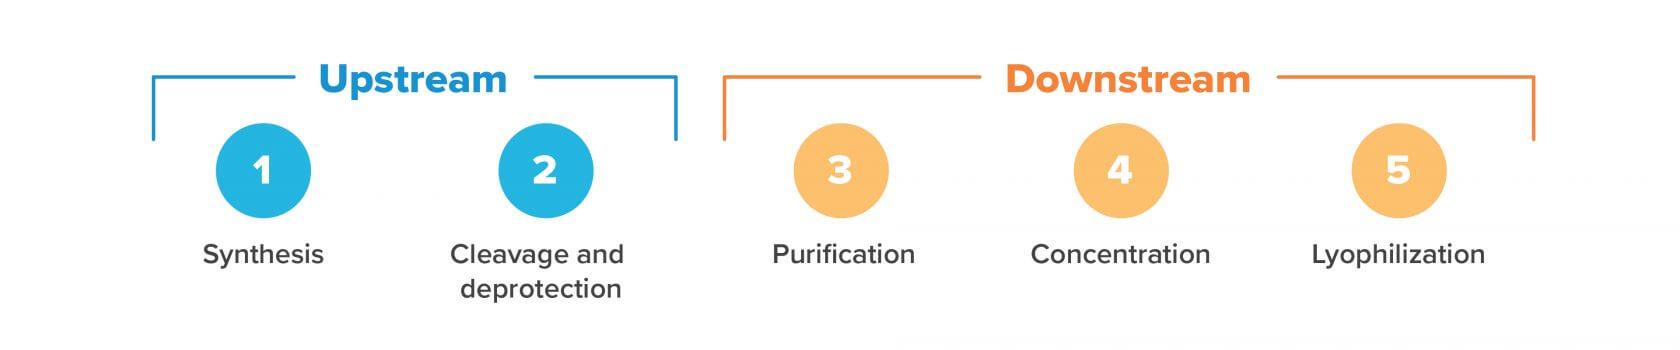 Oligonucleotide manufacturing process